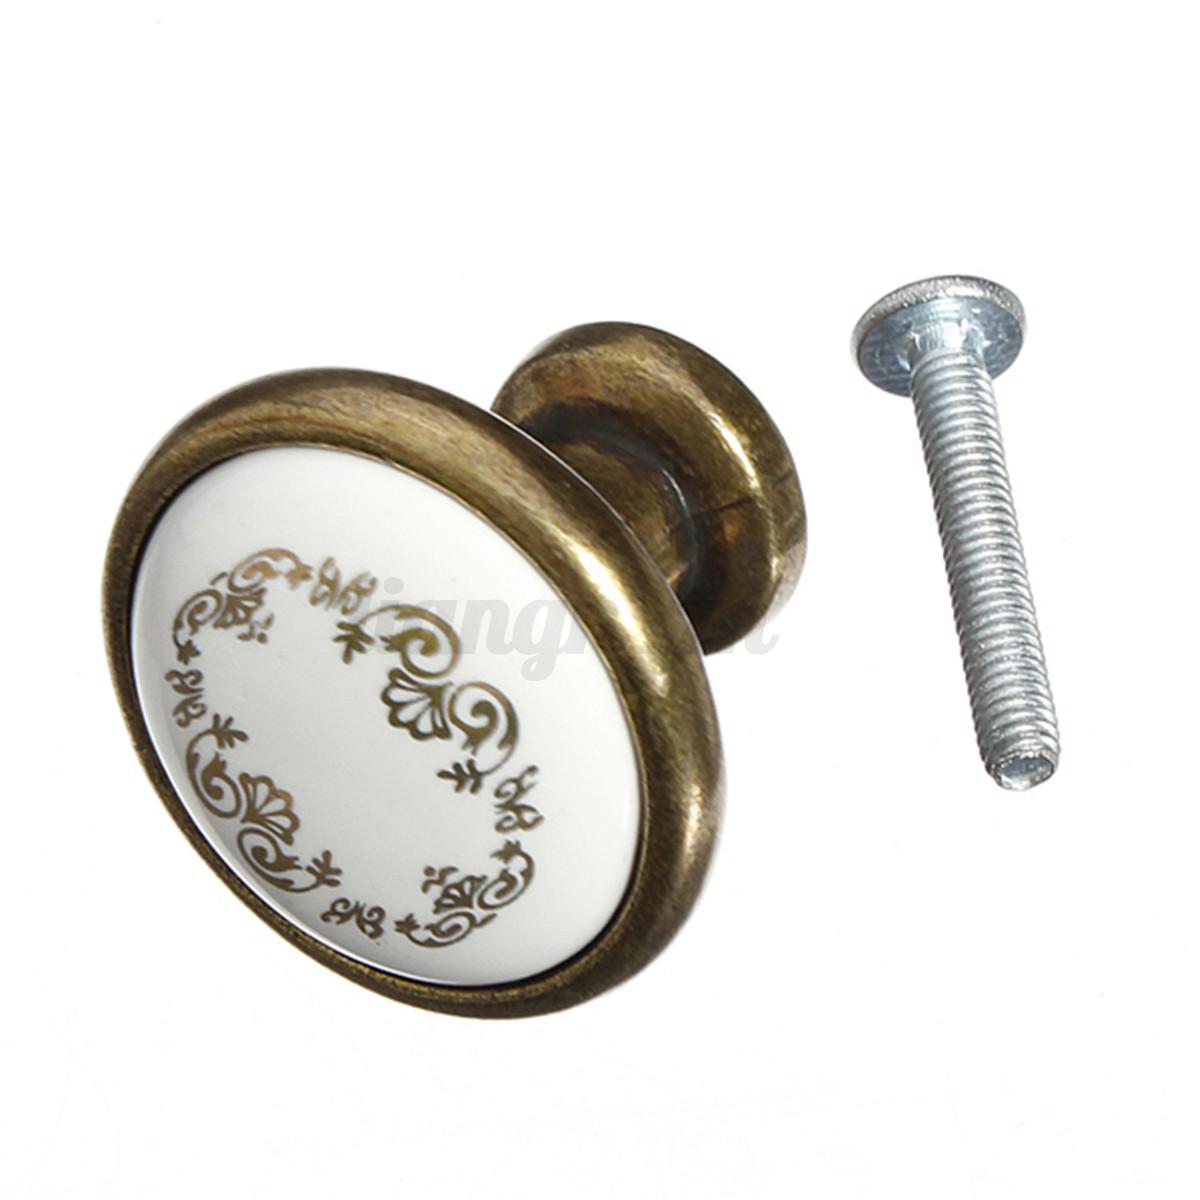 boutons poign e de porte armoire placard cabinet meuble tiroir knob vari t ebay. Black Bedroom Furniture Sets. Home Design Ideas